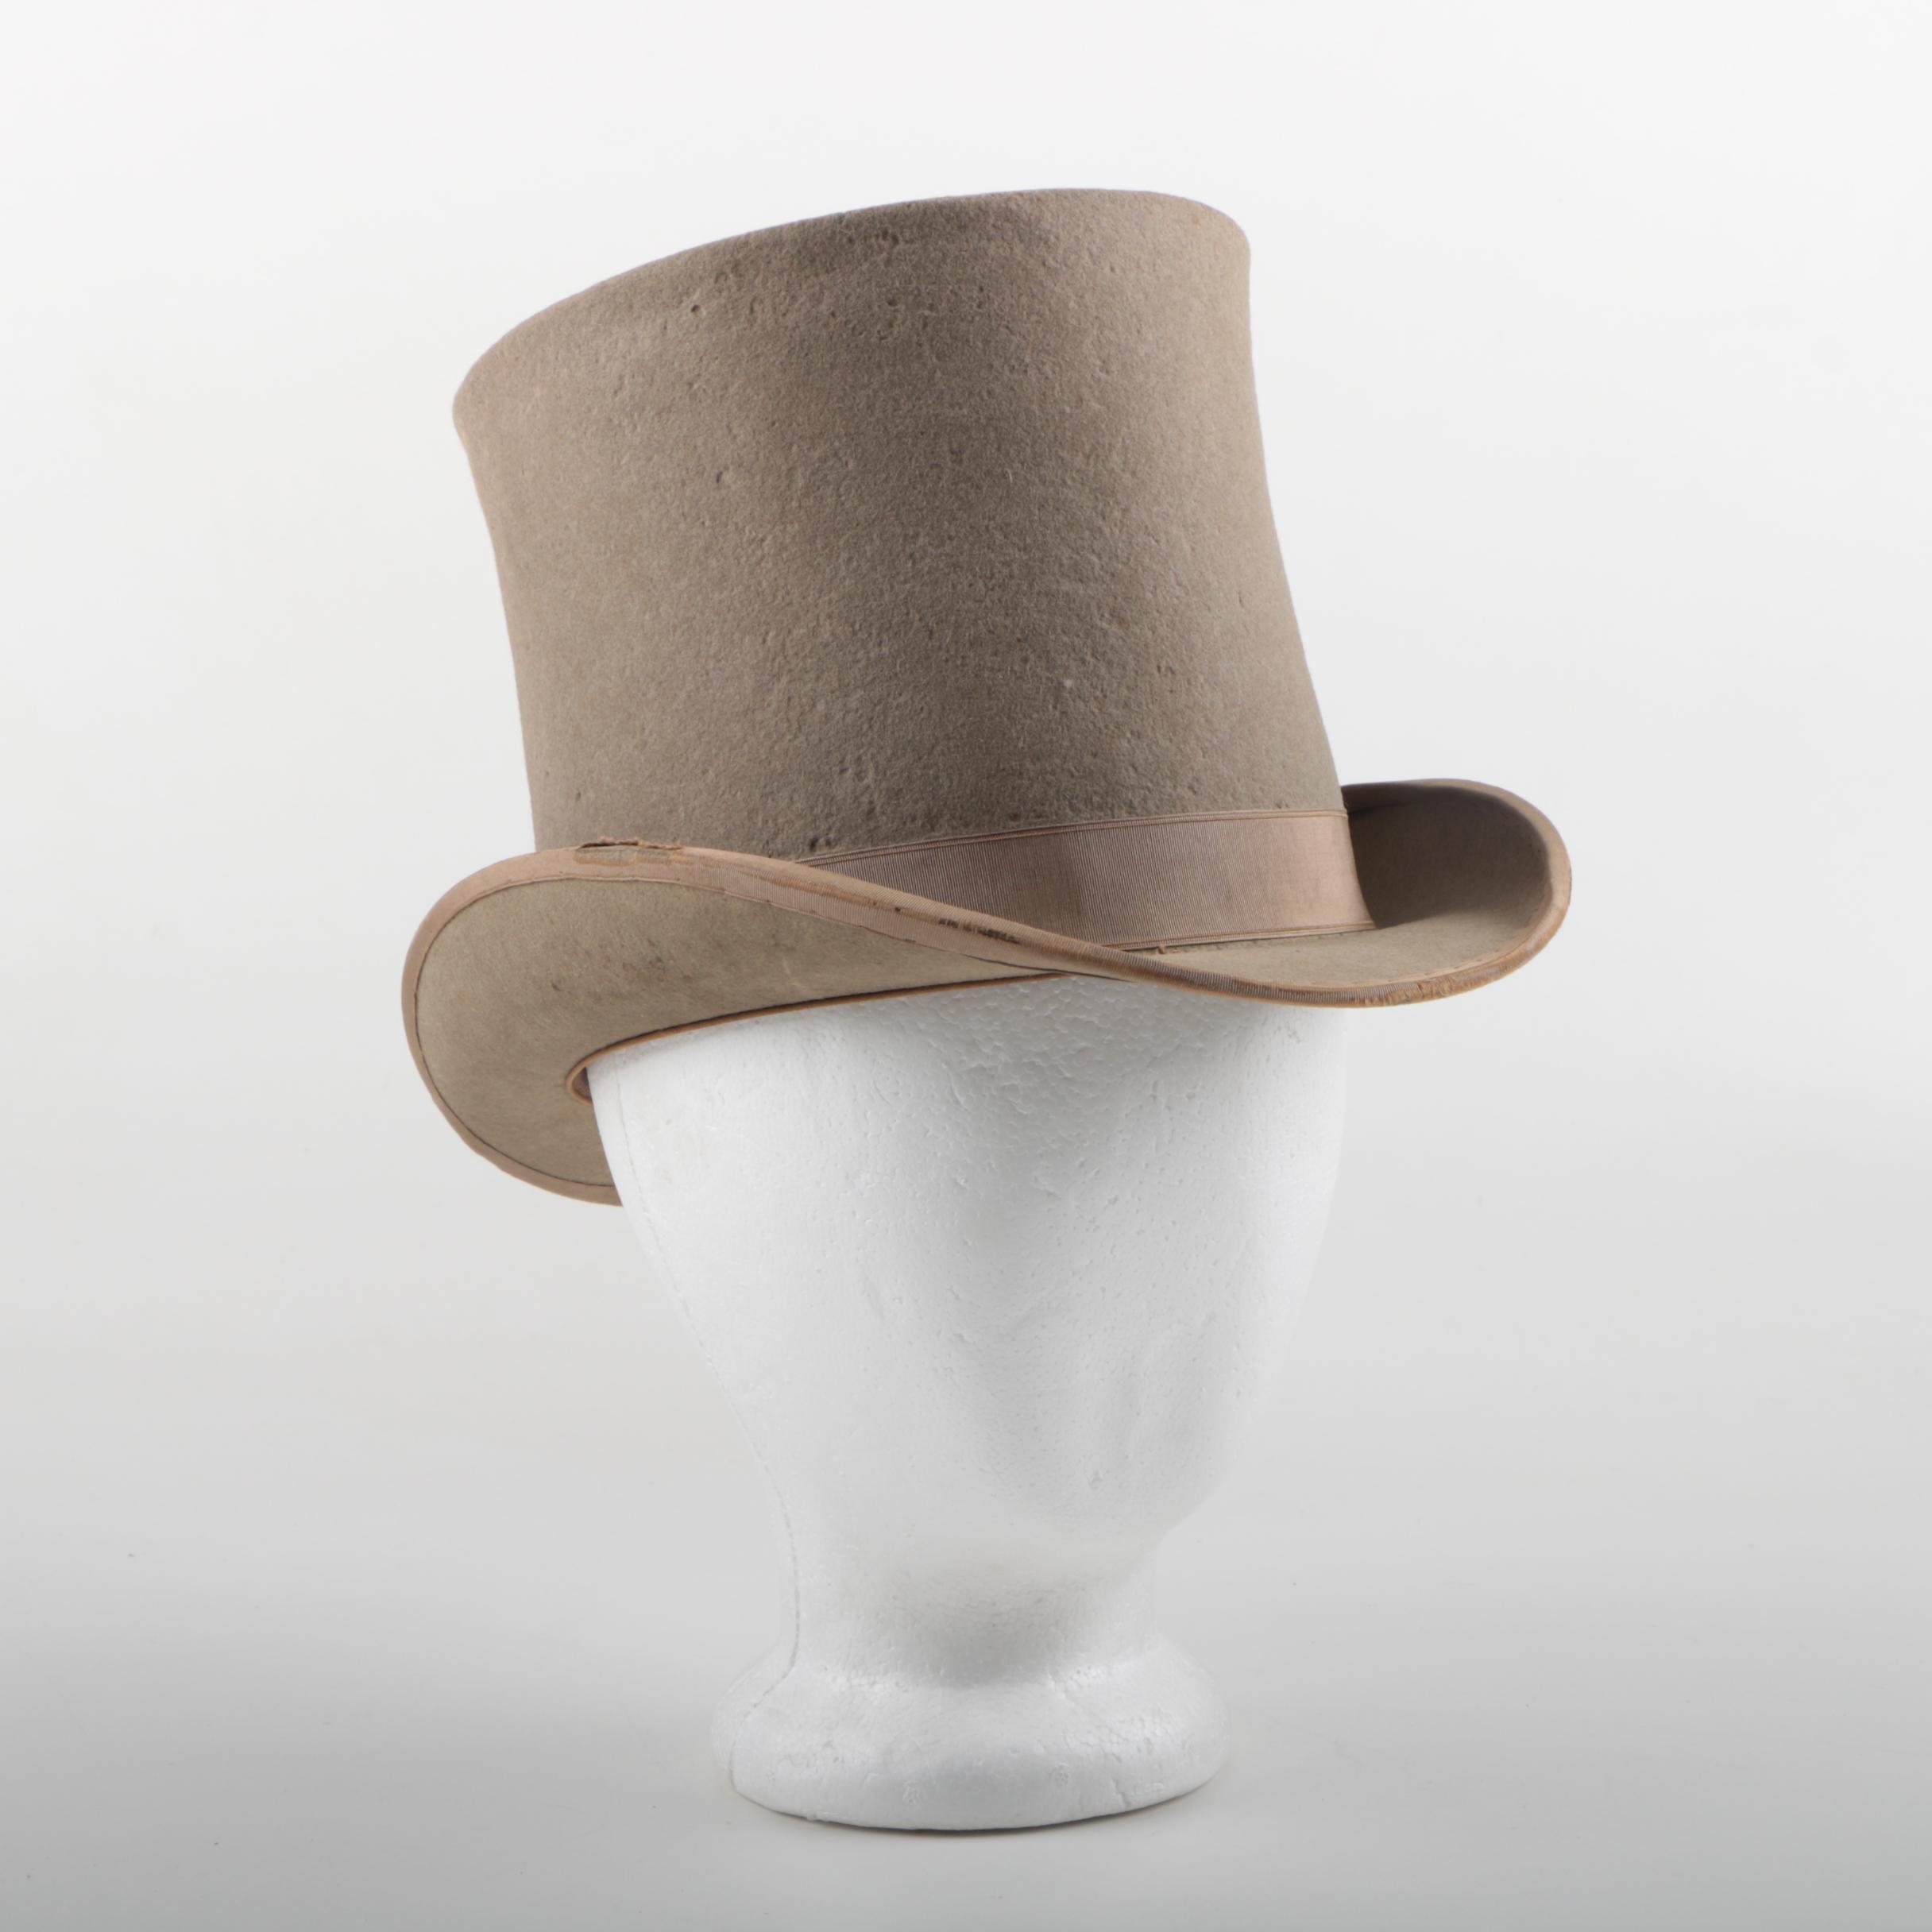 Men's Vintage Premier Suel Felted Top Hat